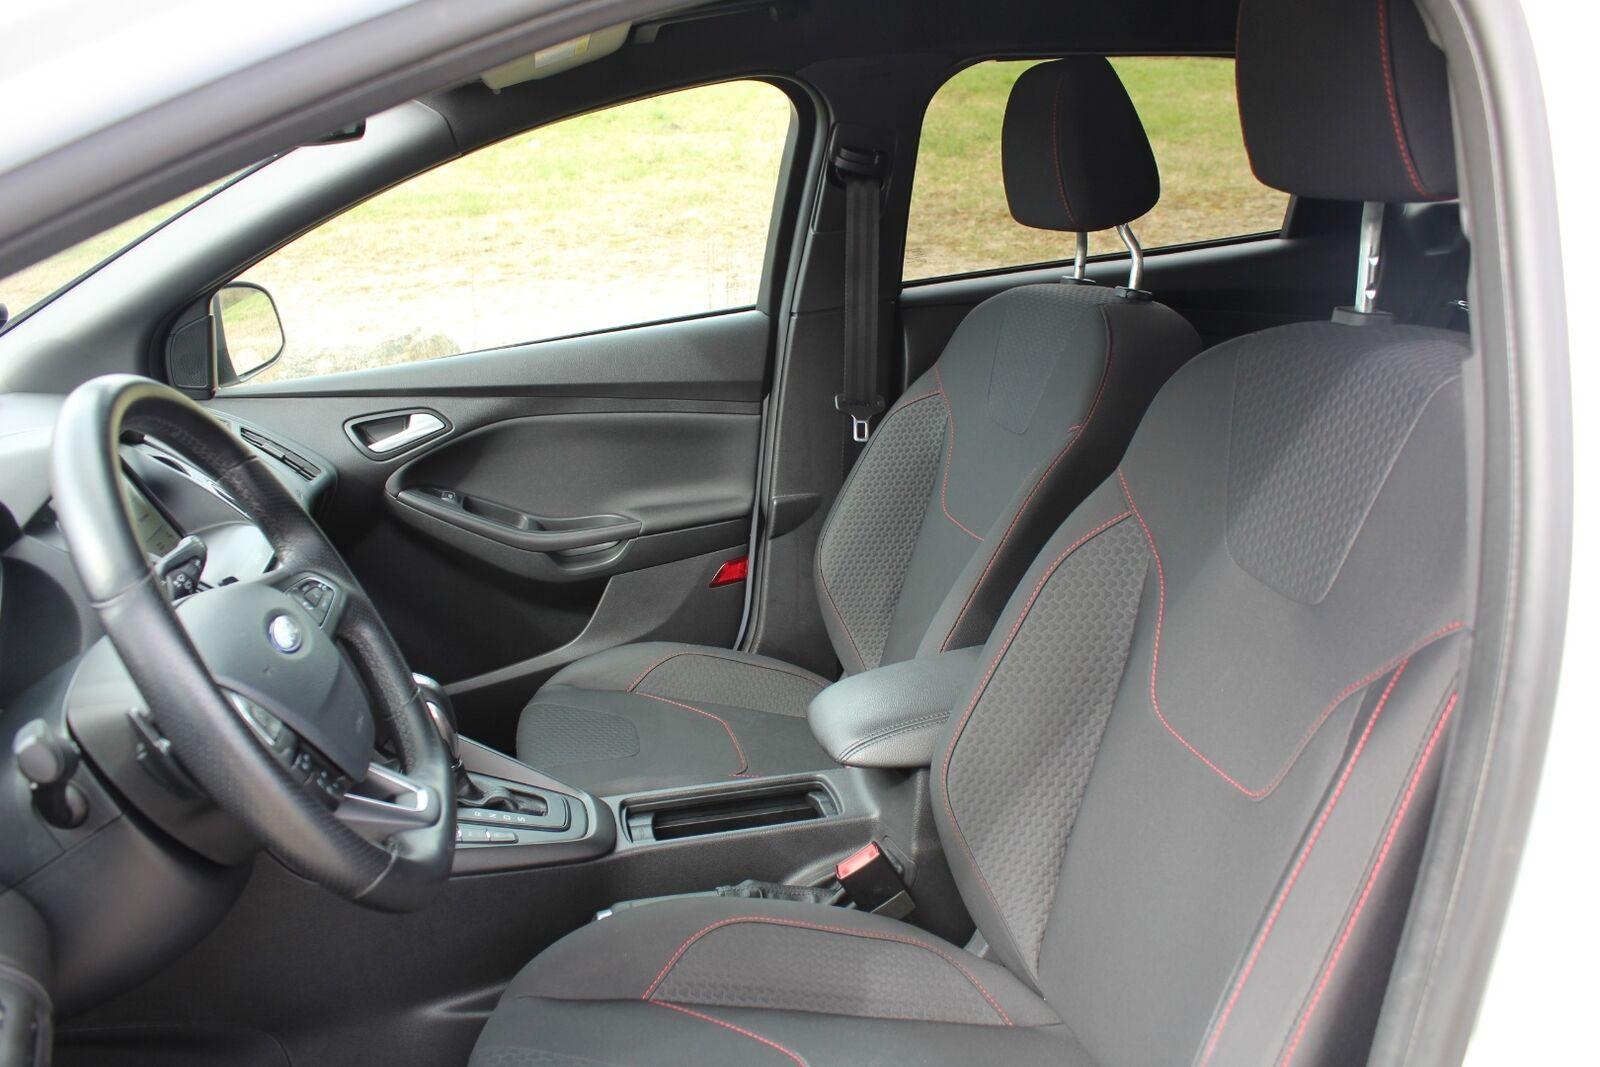 Ford Focus 1,5 TDCi 120 ST-Line stc. aut. - billede 13